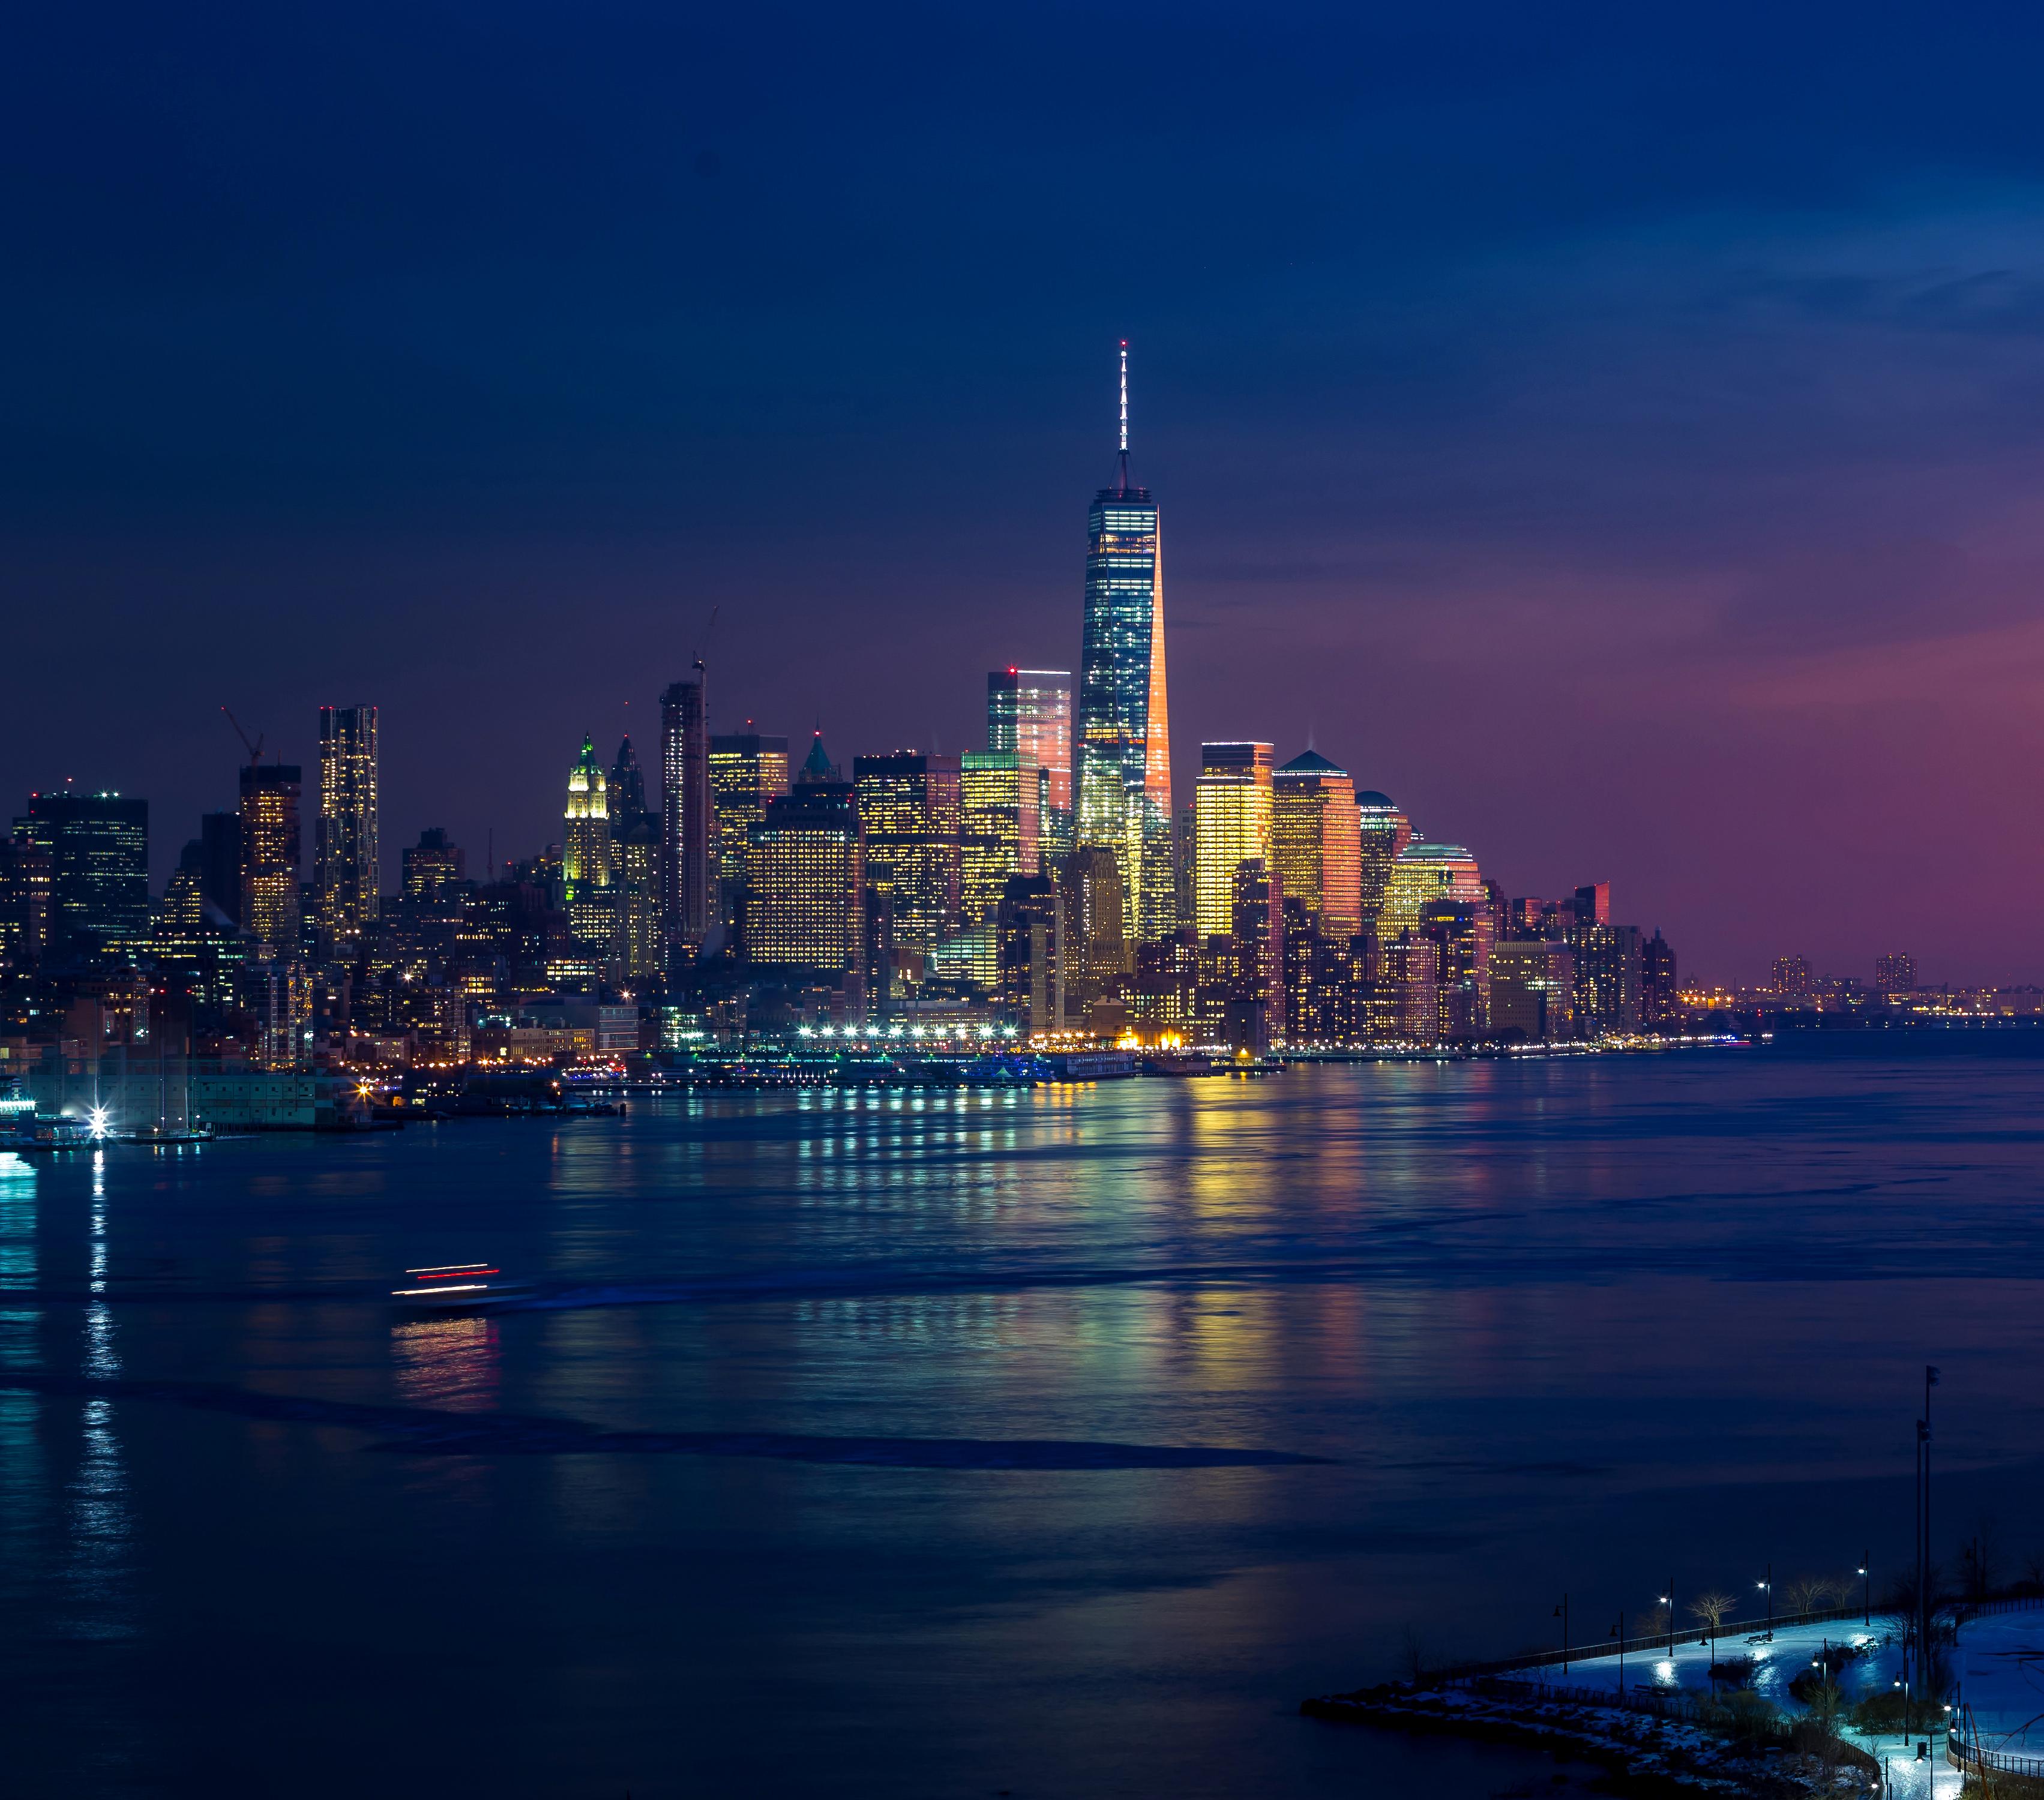 1920x1080 New York Skycrapper 4k Buildings Lights Laptop